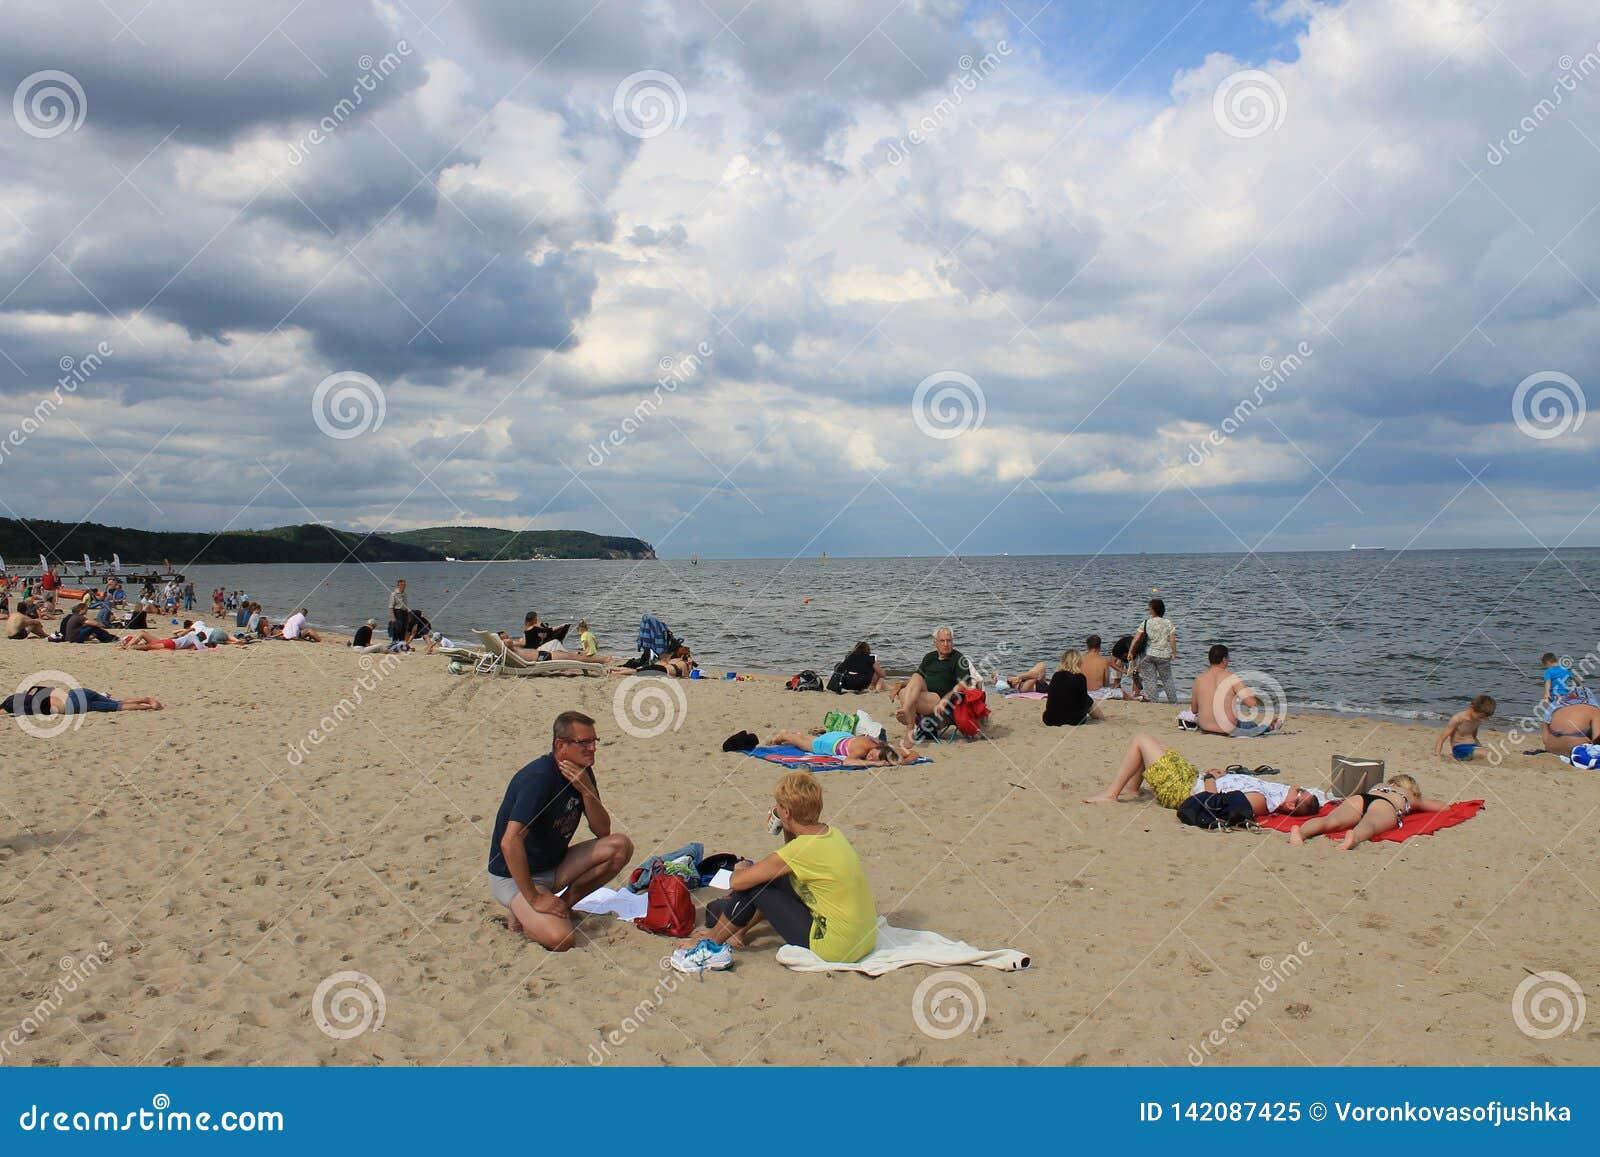 People sunbathing on the beach of Sopot, Poland